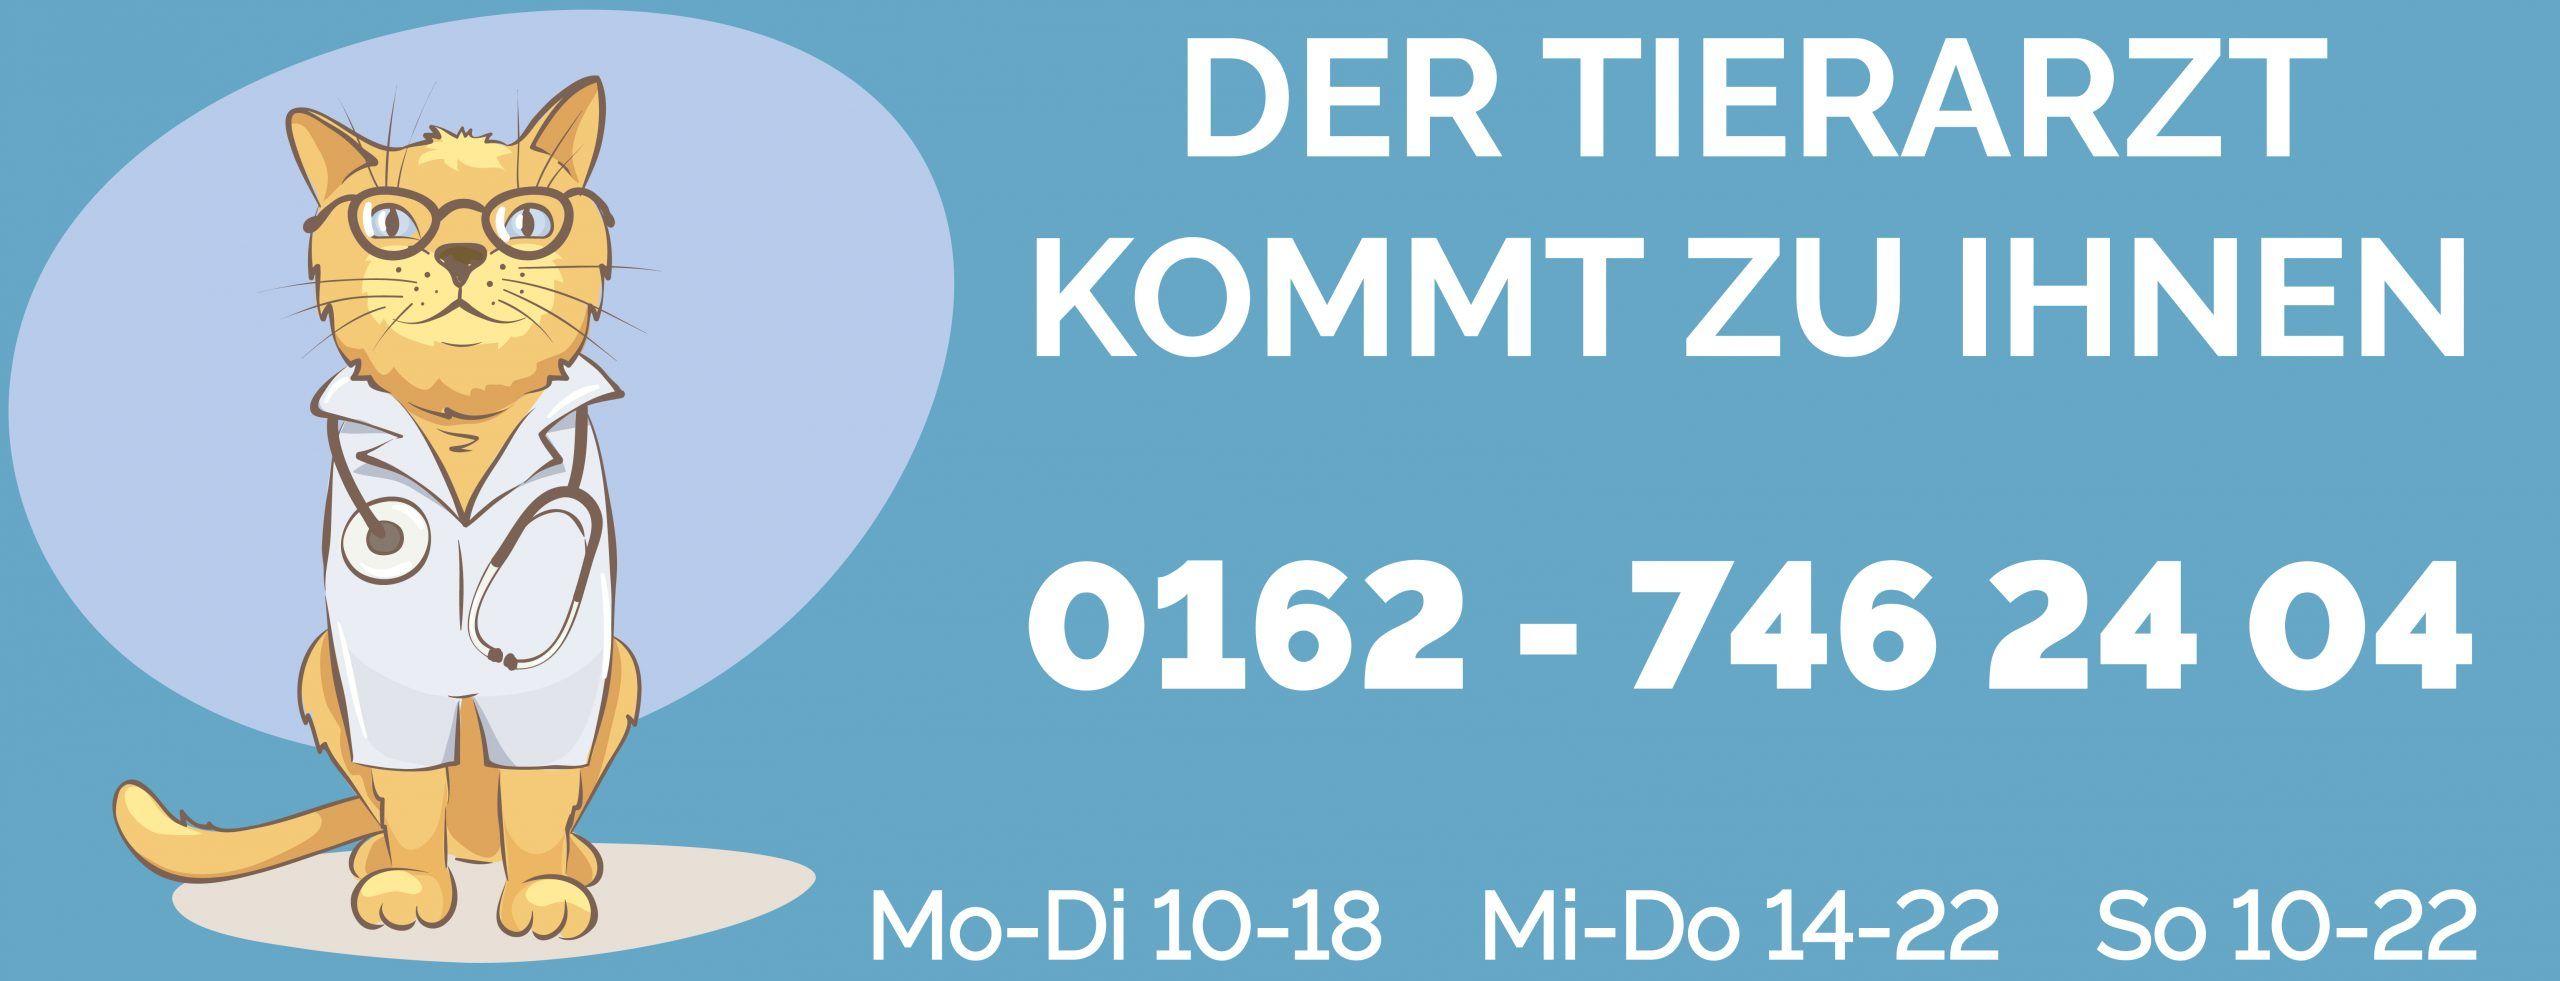 Tierarzt-mobil-berlin